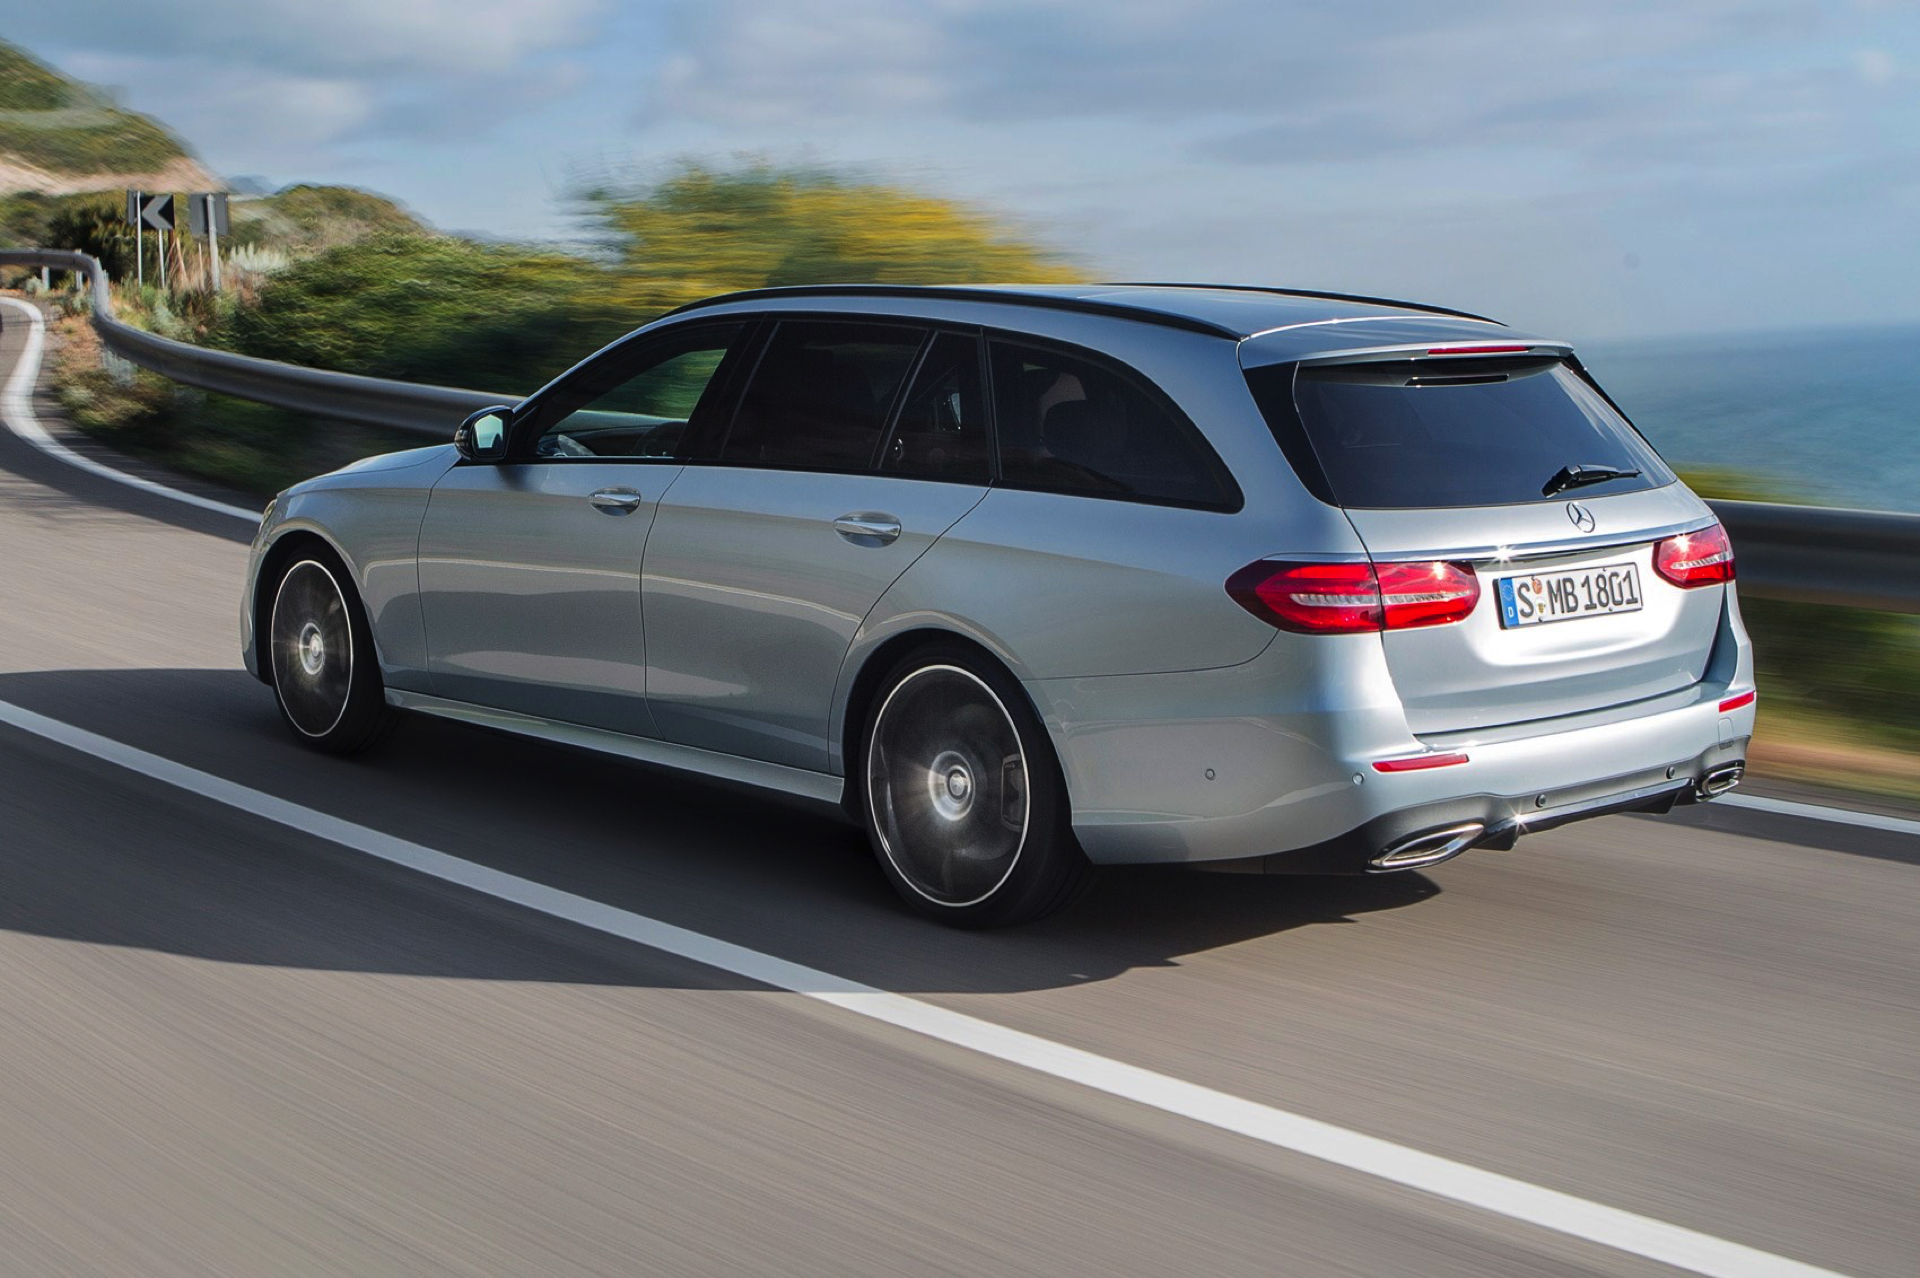 Mercedes-Benz E-Klasse Estate -8- Autovisie.nl